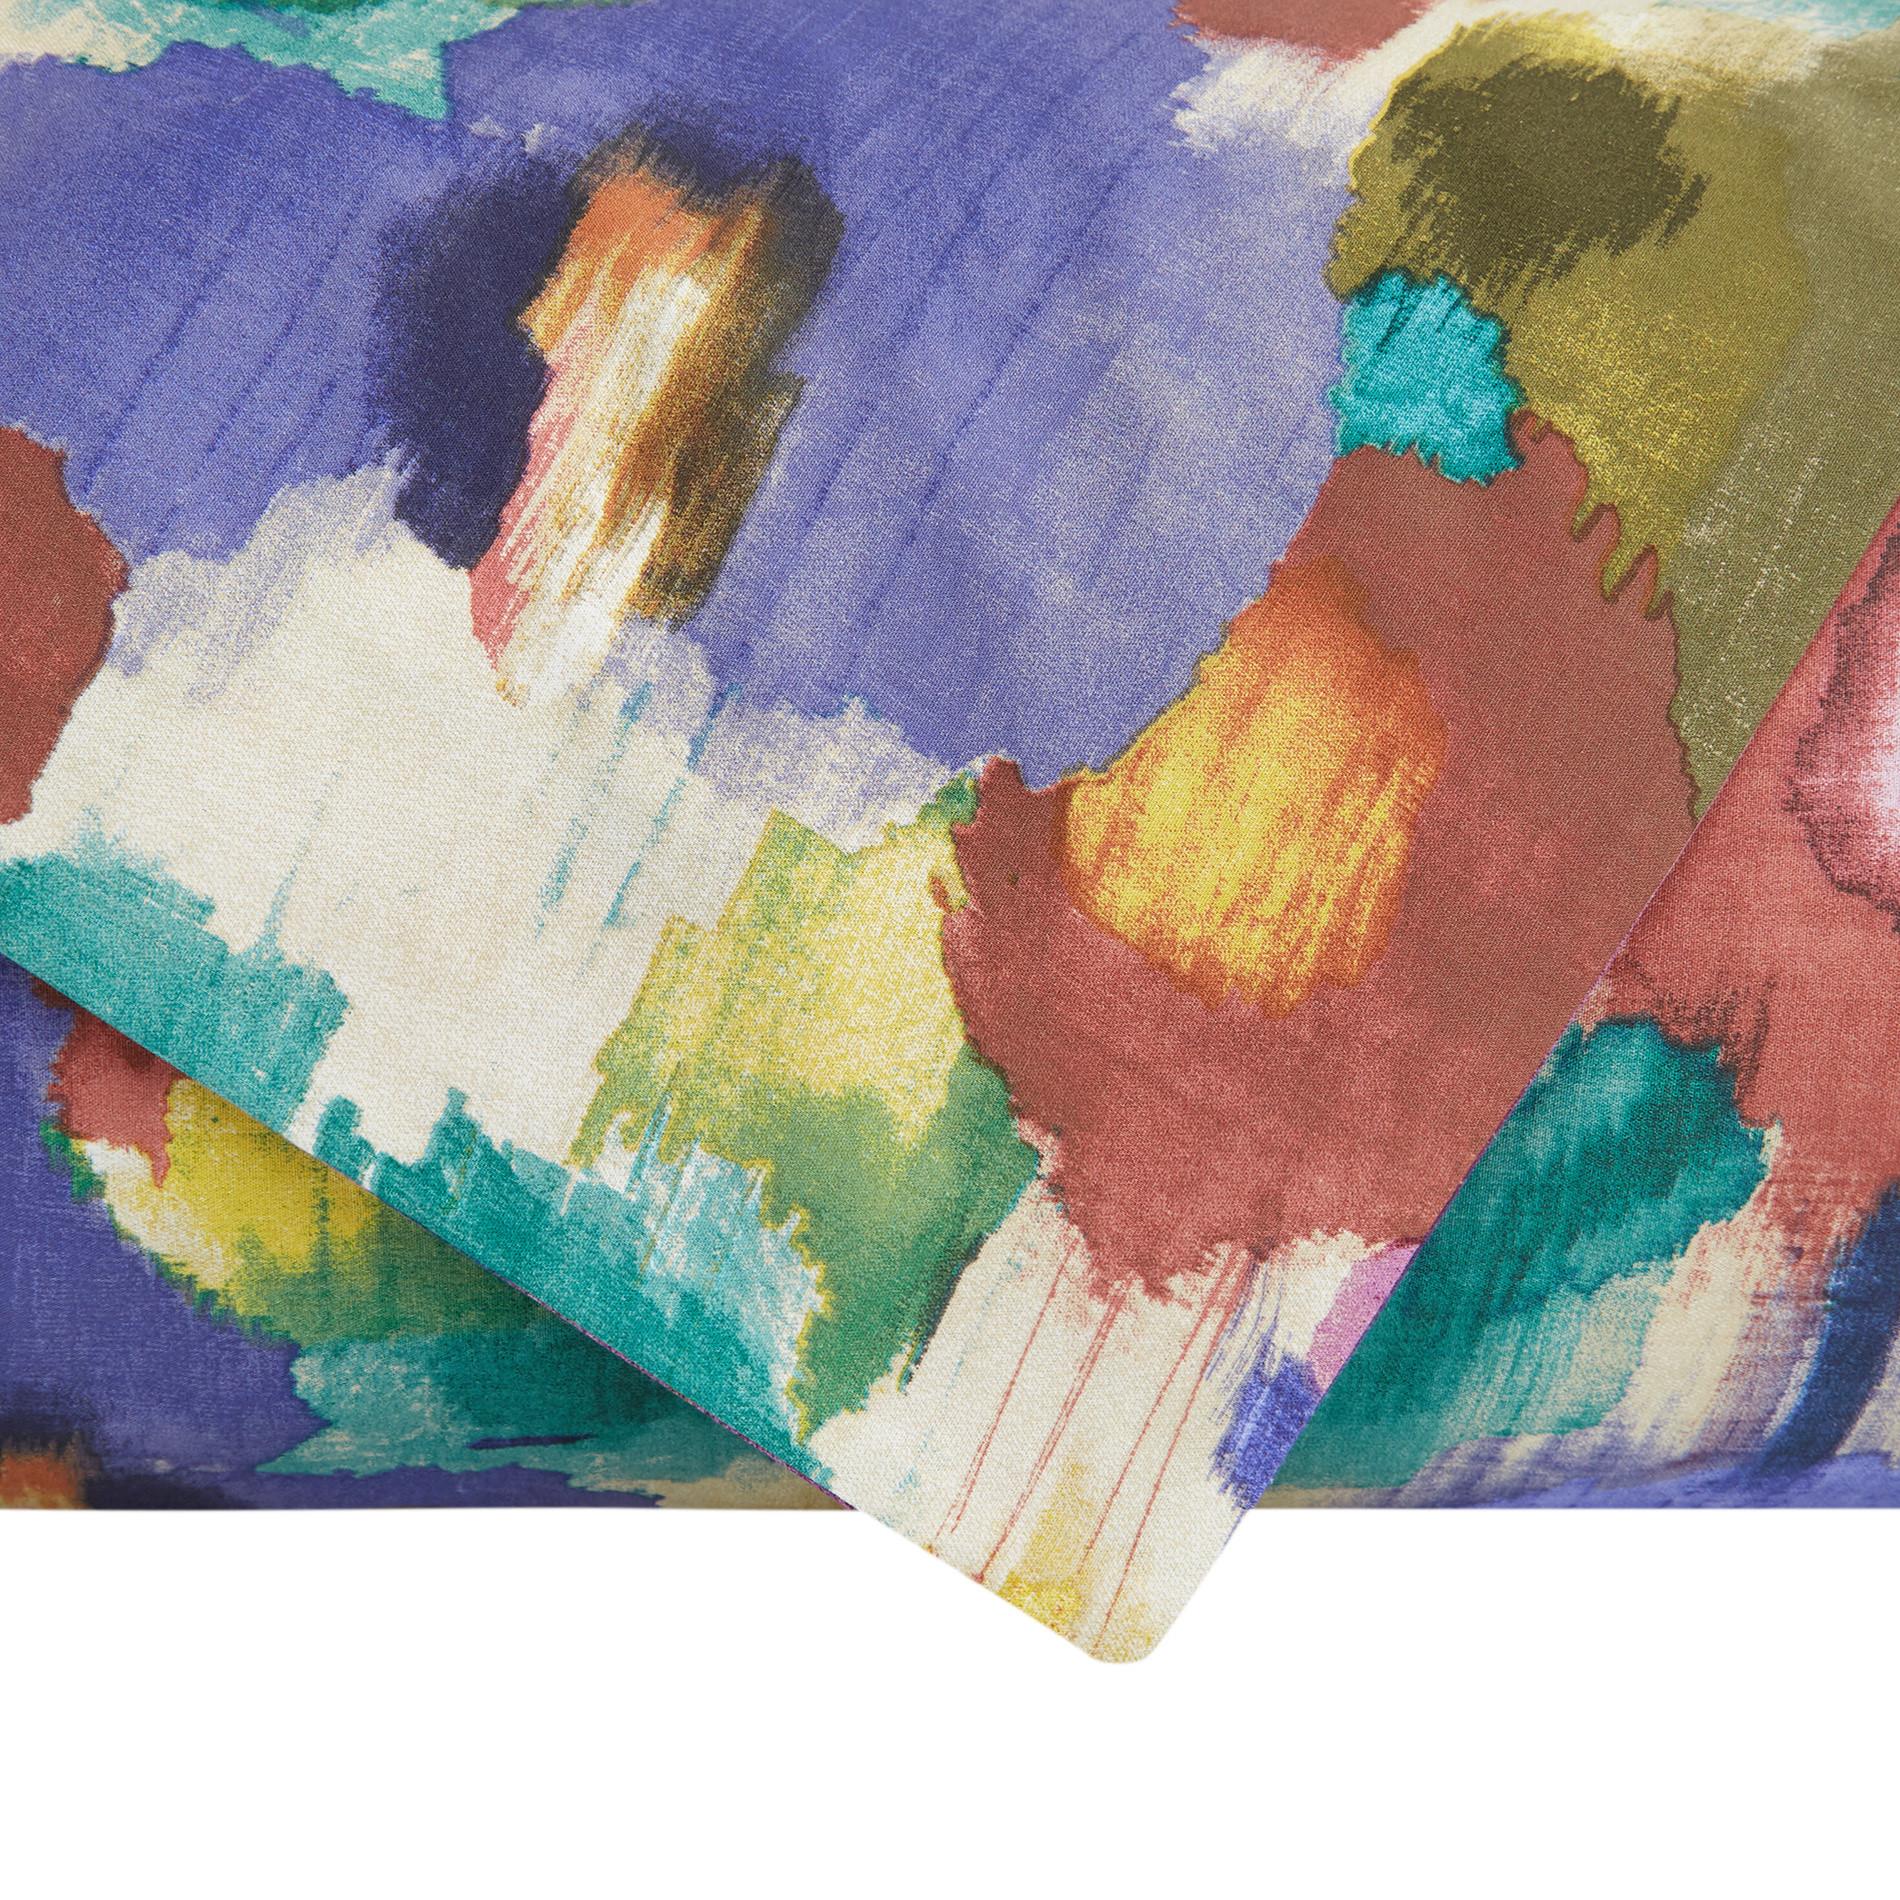 Copripiumino cotone biologico fantasia amazzonia, Multicolor, large image number 1